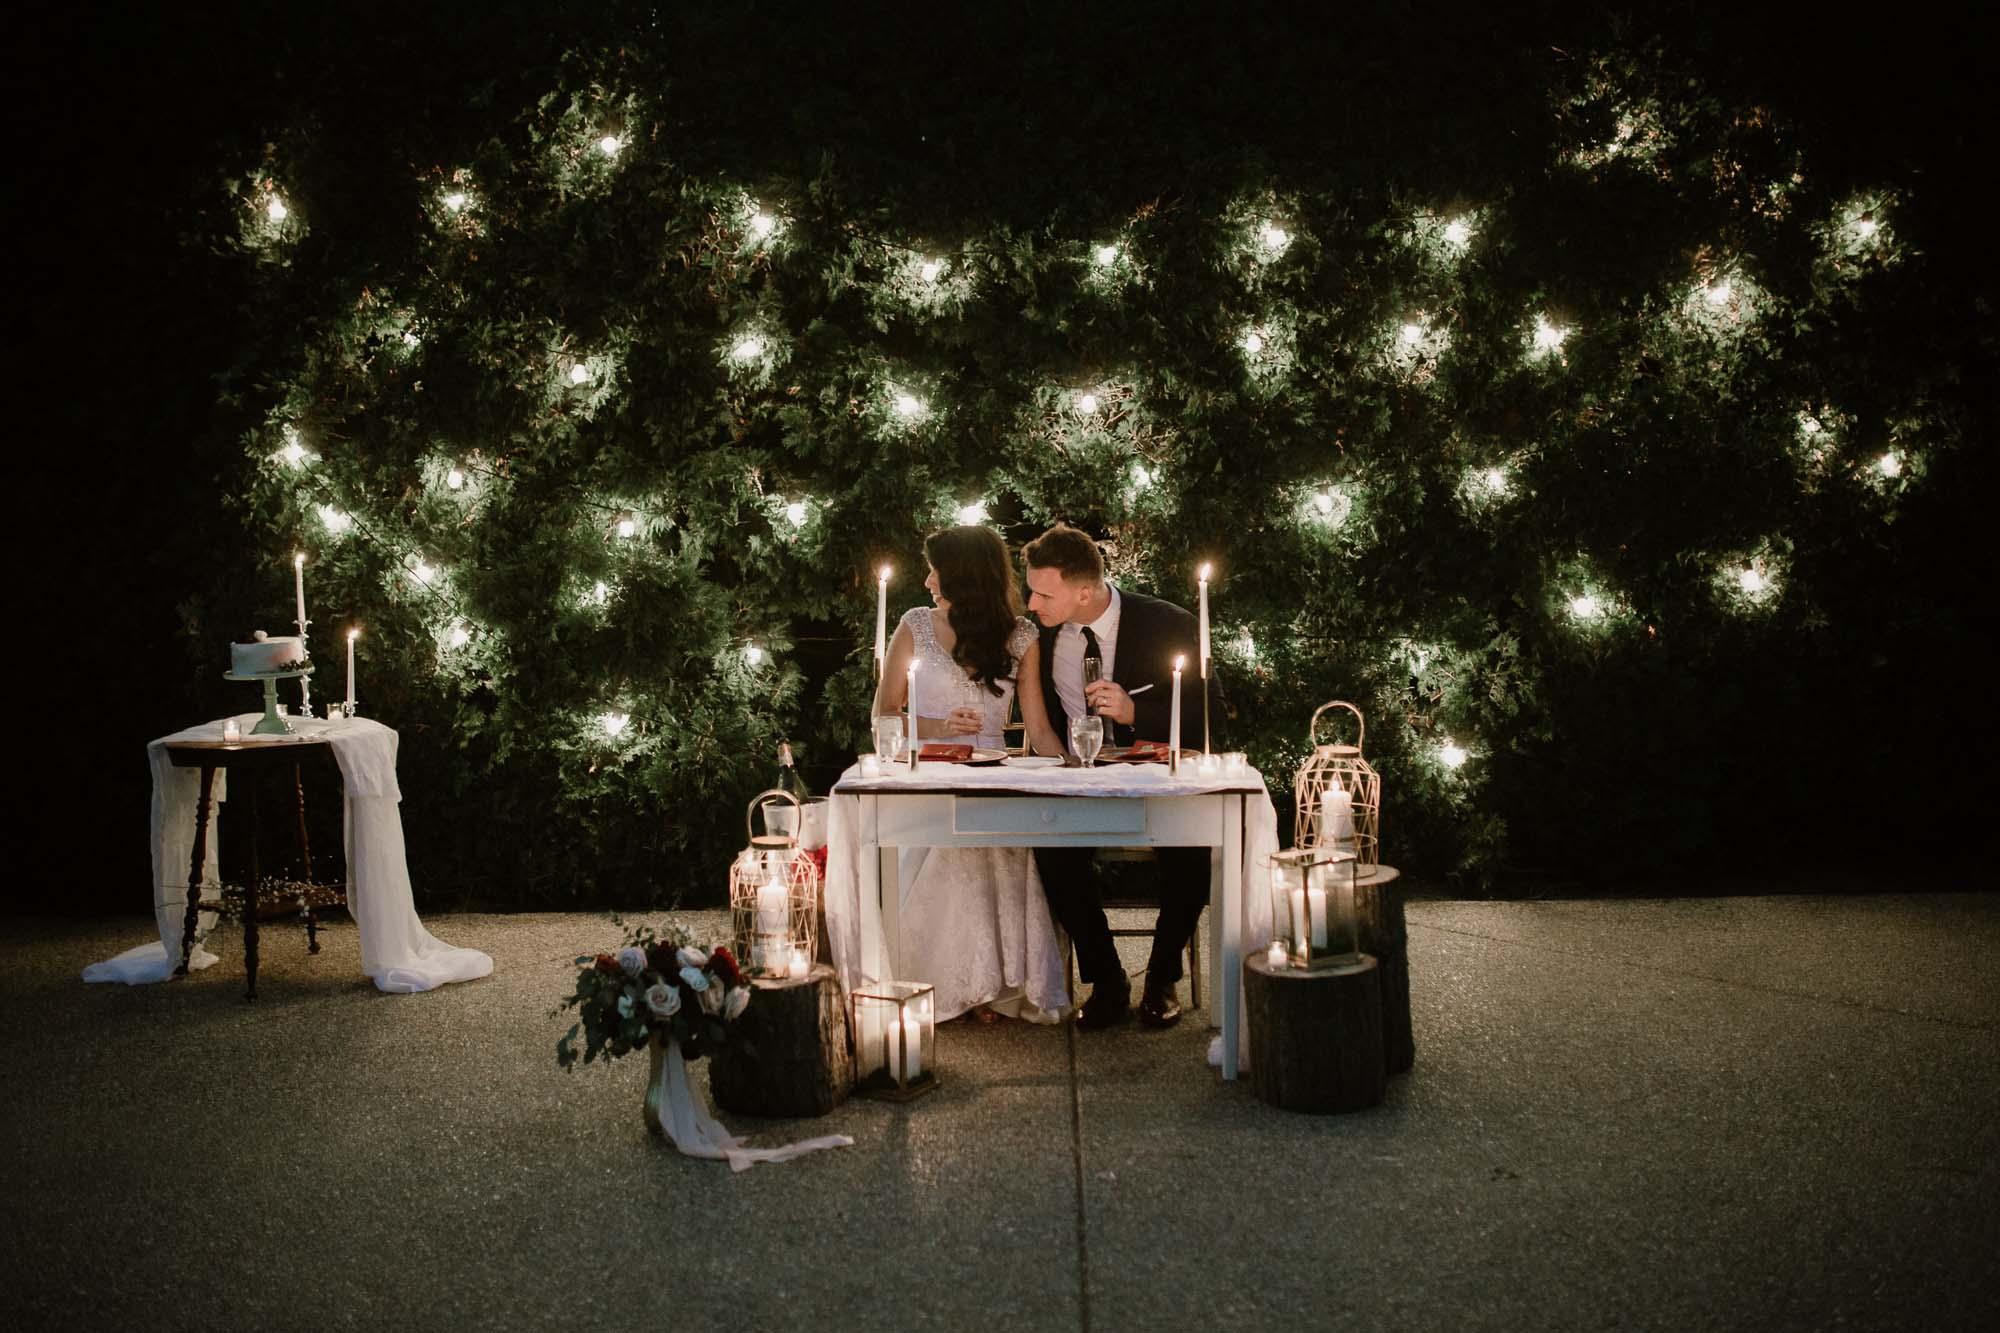 champaign_il_wedding_photography-0959.jpg